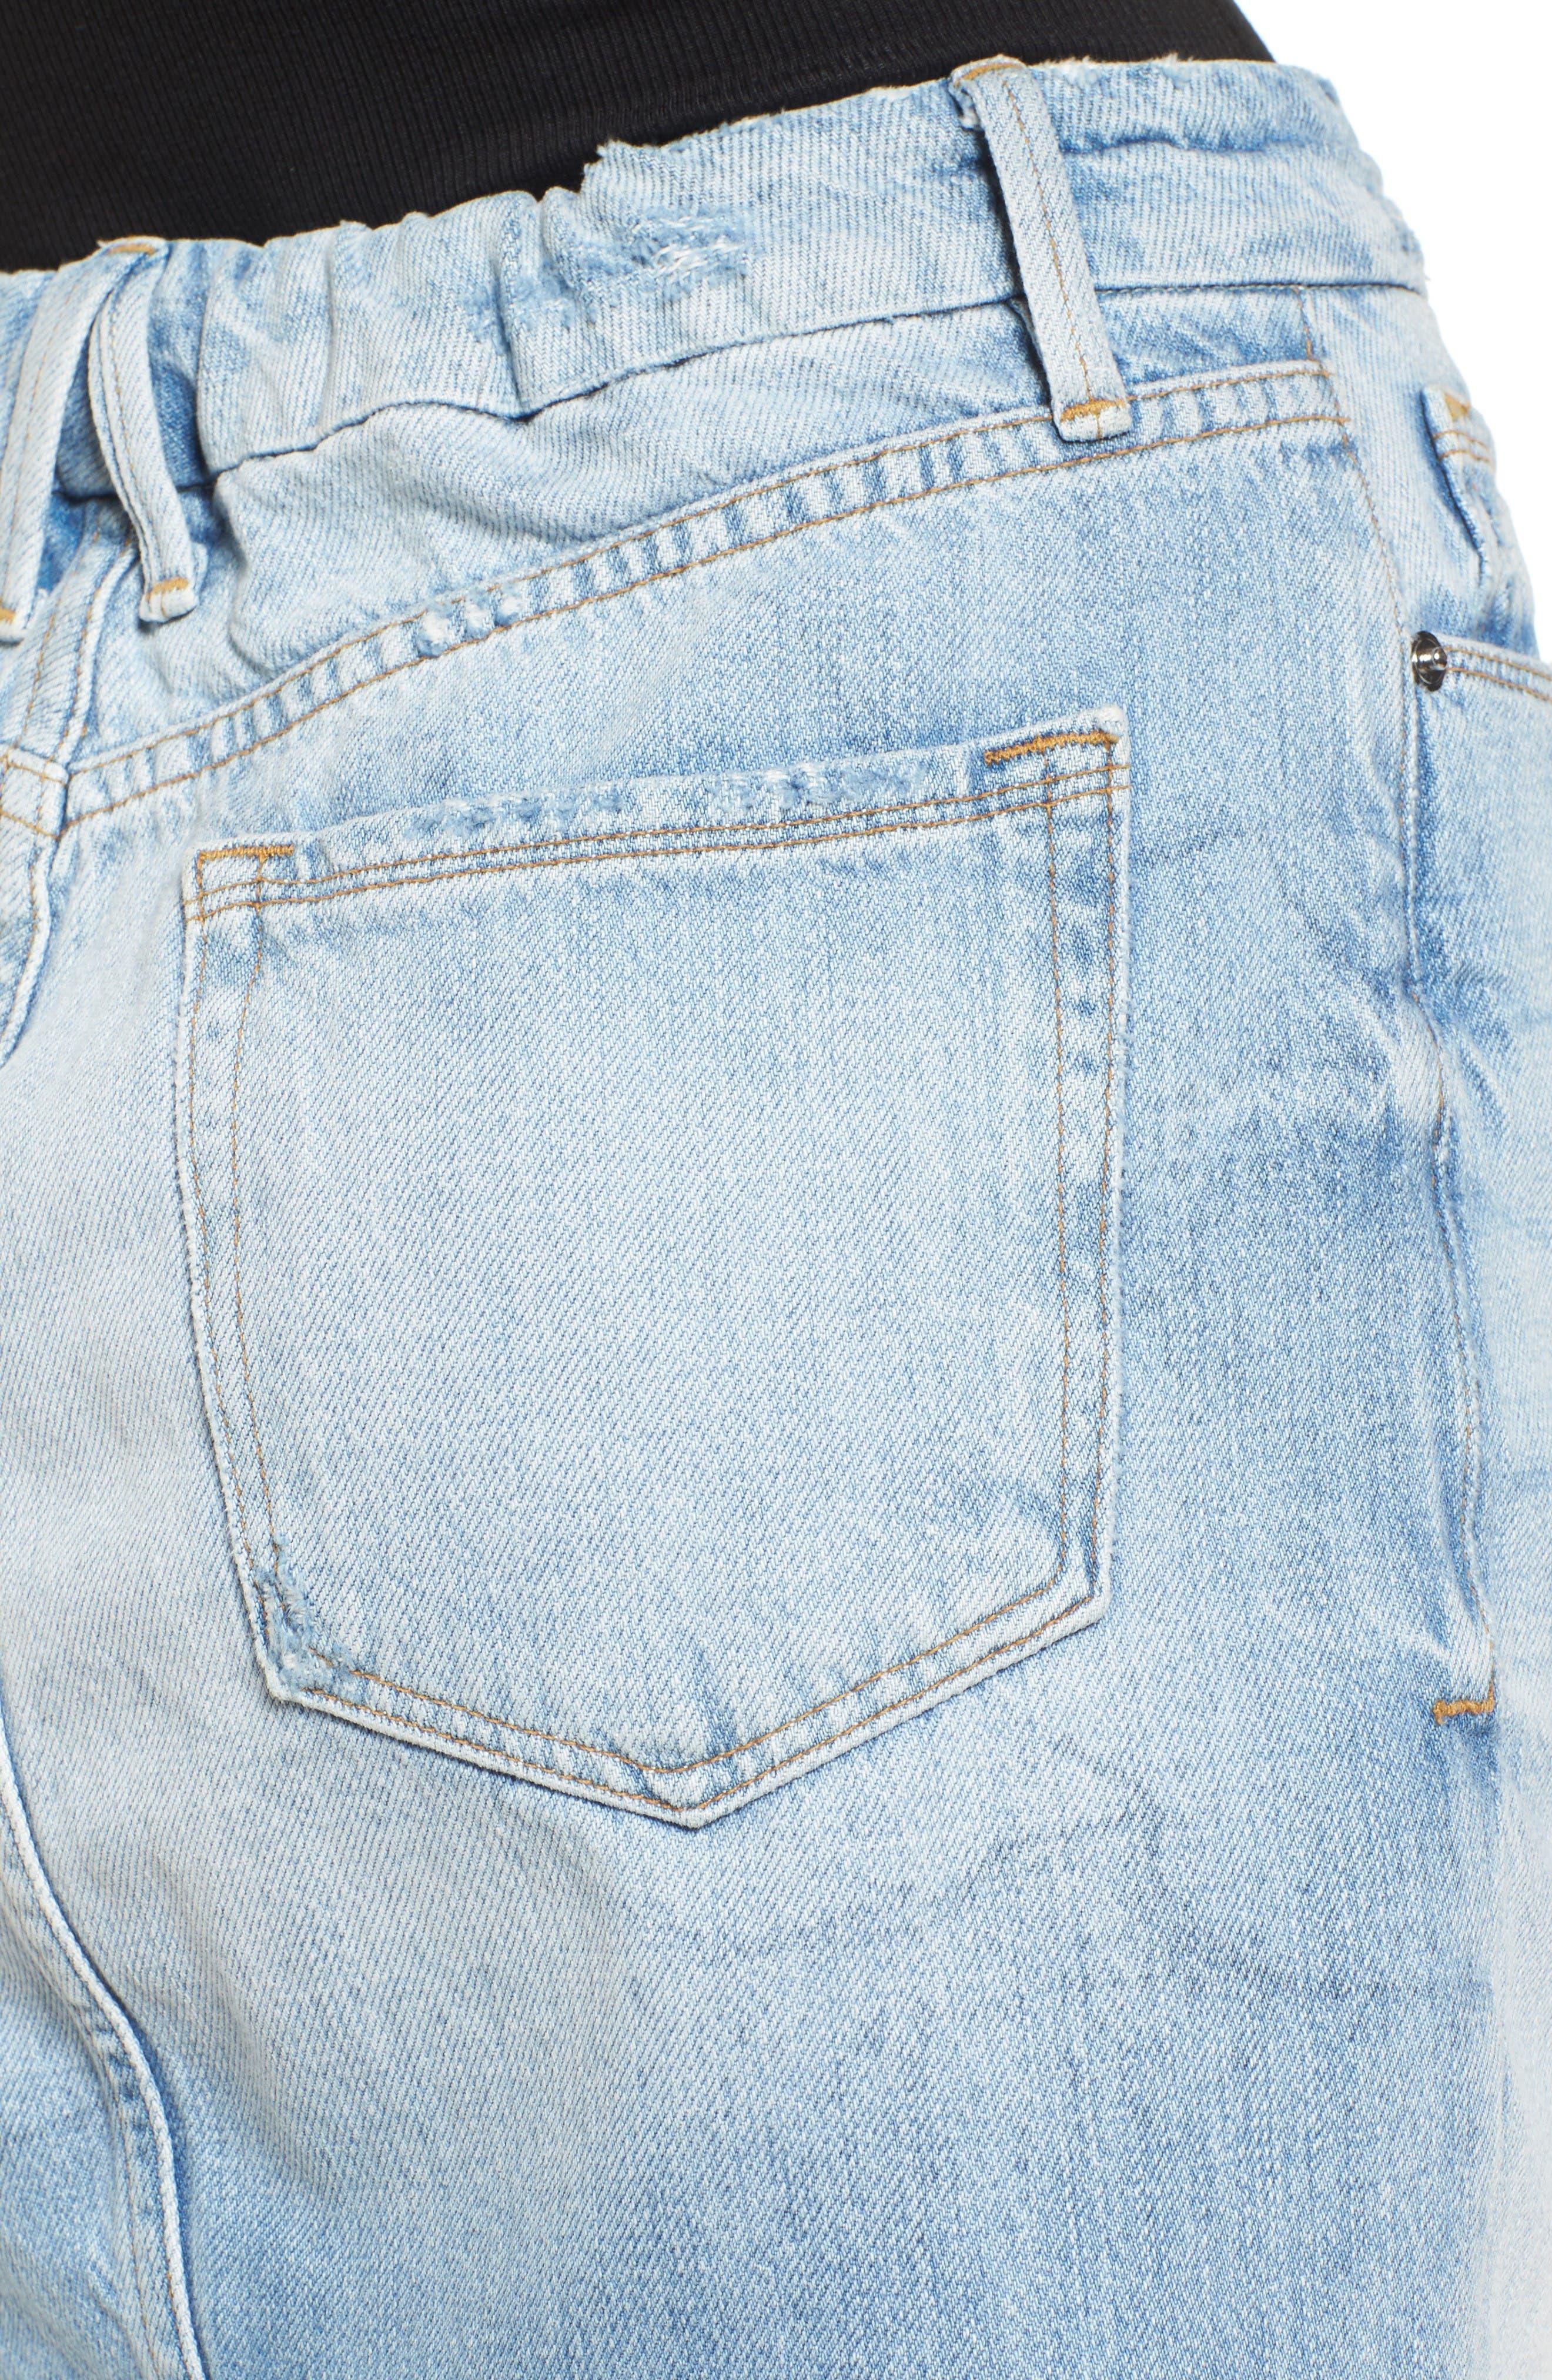 The Mini High Waist Denim Miniskirt,                             Alternate thumbnail 4, color,                             Blue033